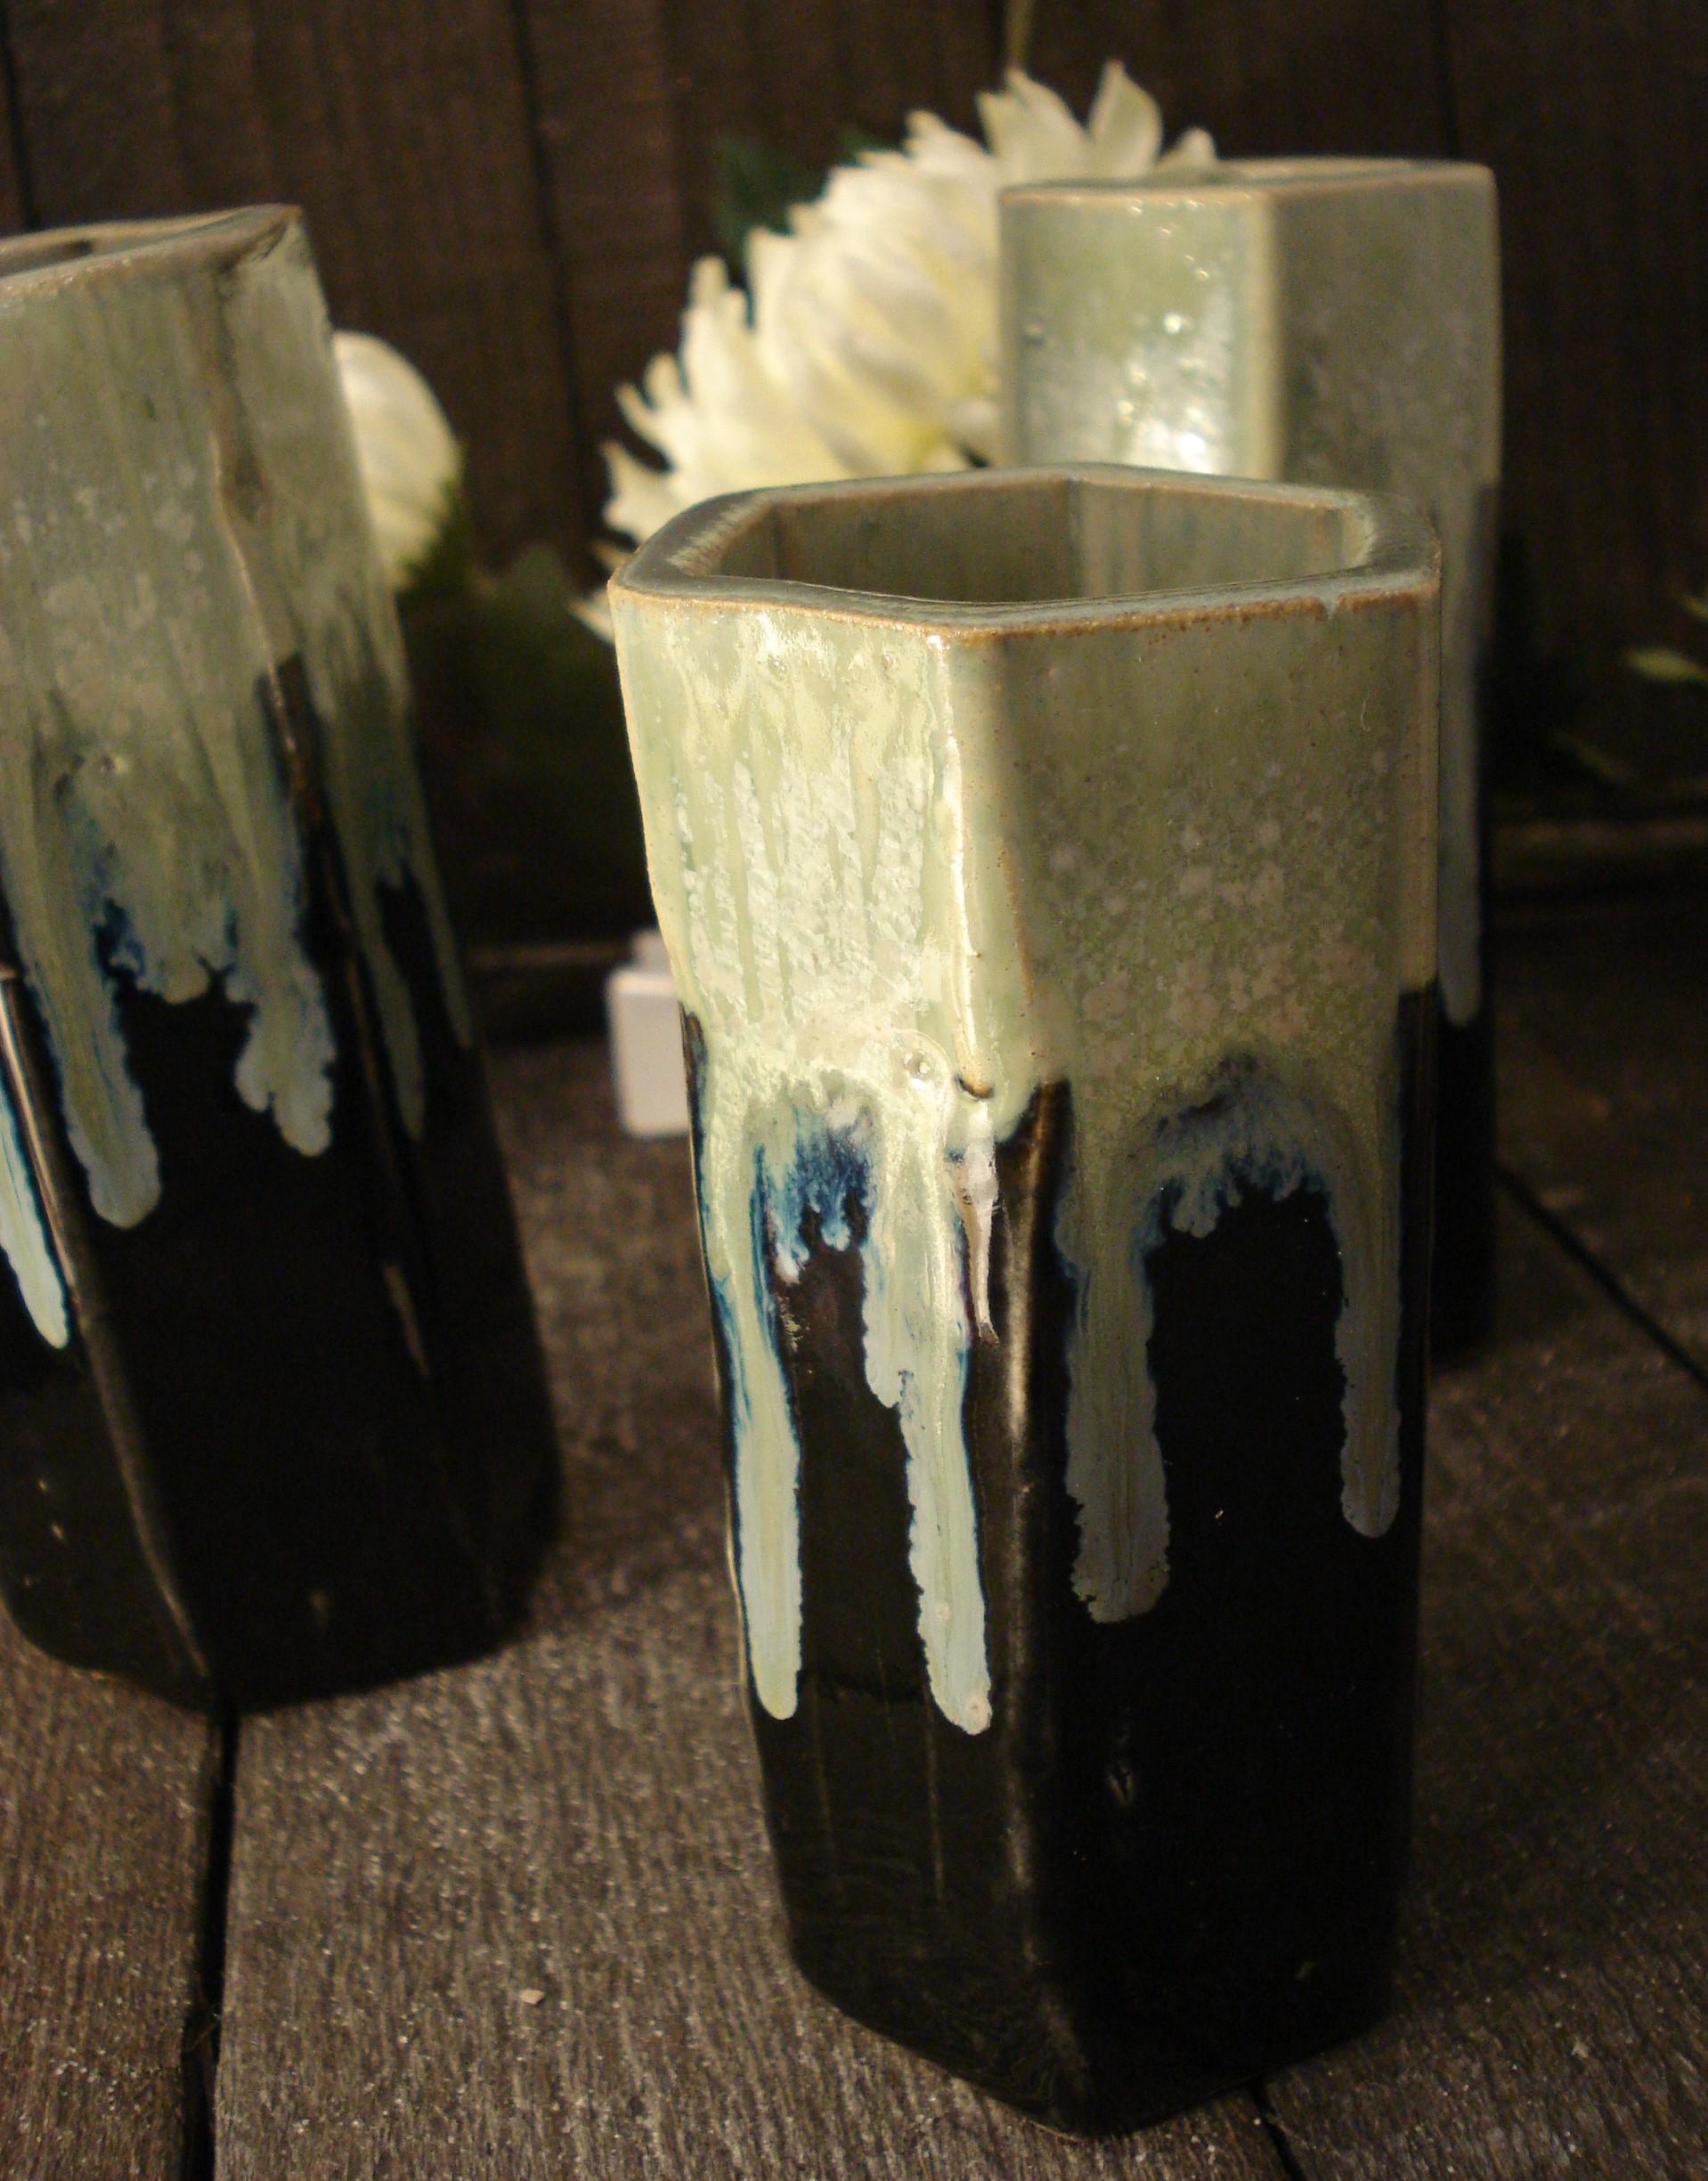 6 kantet keramik vase Sort/grøn